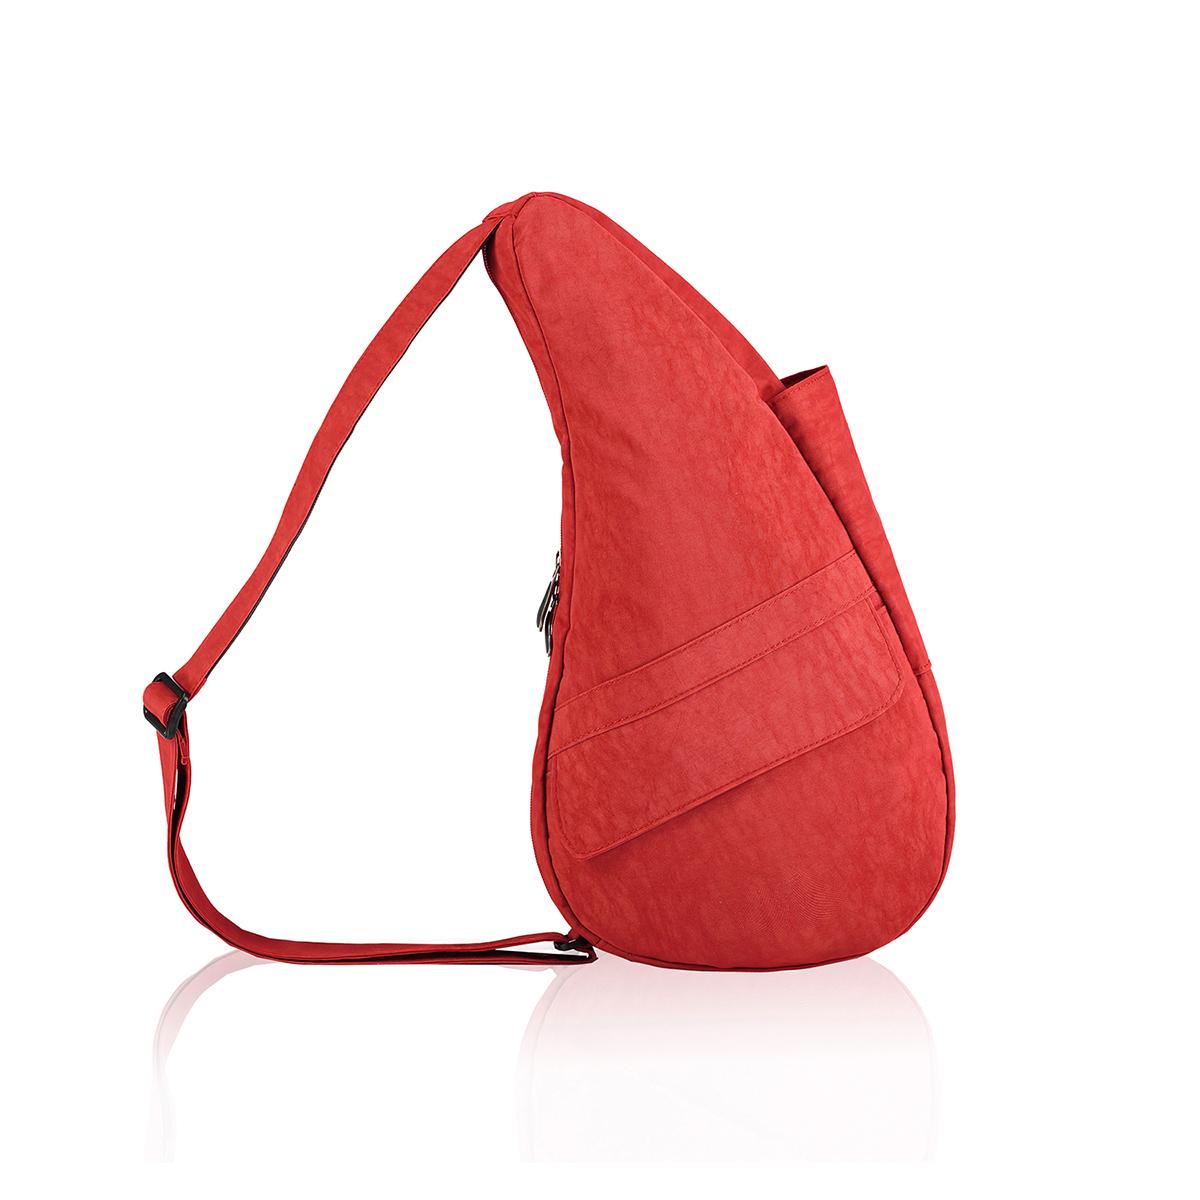 Healthy Back Bag/ヘルシーバックバッグ/ショルダーバッグ/ボディバッグ/旅行バッグ/軽量/レディース/メンズ 《限定ポーチ付》 公式ストア ヘルシーバックバッグ テクスチャードナイロン Sサイズ トスカンレッド